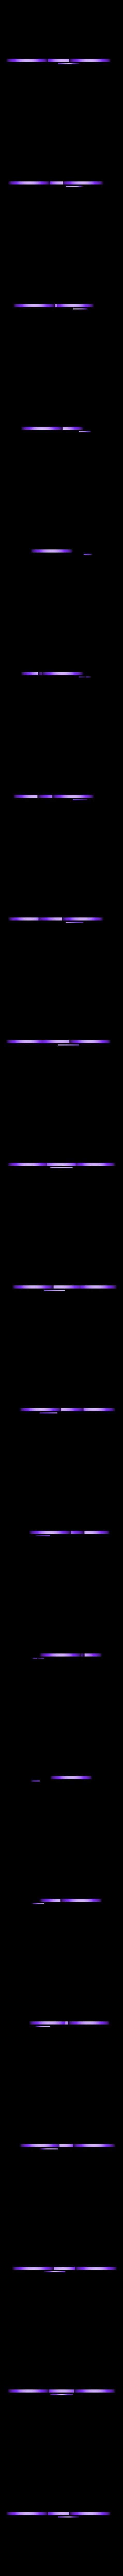 book_worm_black.STL Download free STL file Muli-color Bookworm Bookmark • Design to 3D print, MosaicManufacturing